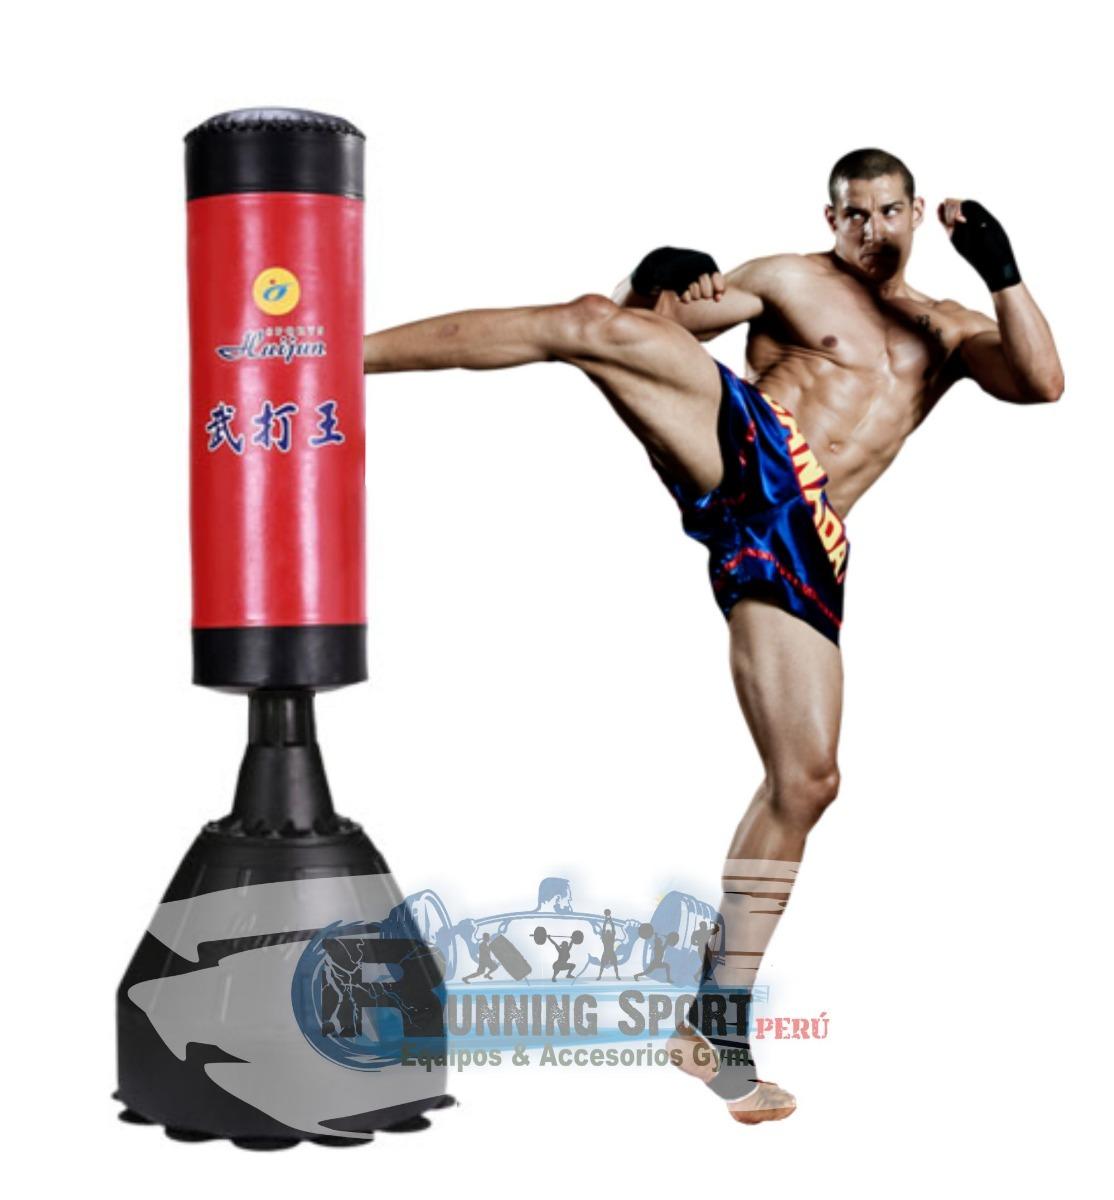 5c3c91e74 Saco Box Piso Importado Muay Thai Boxeo Tae Kwon Do Karate - S/ 450 ...